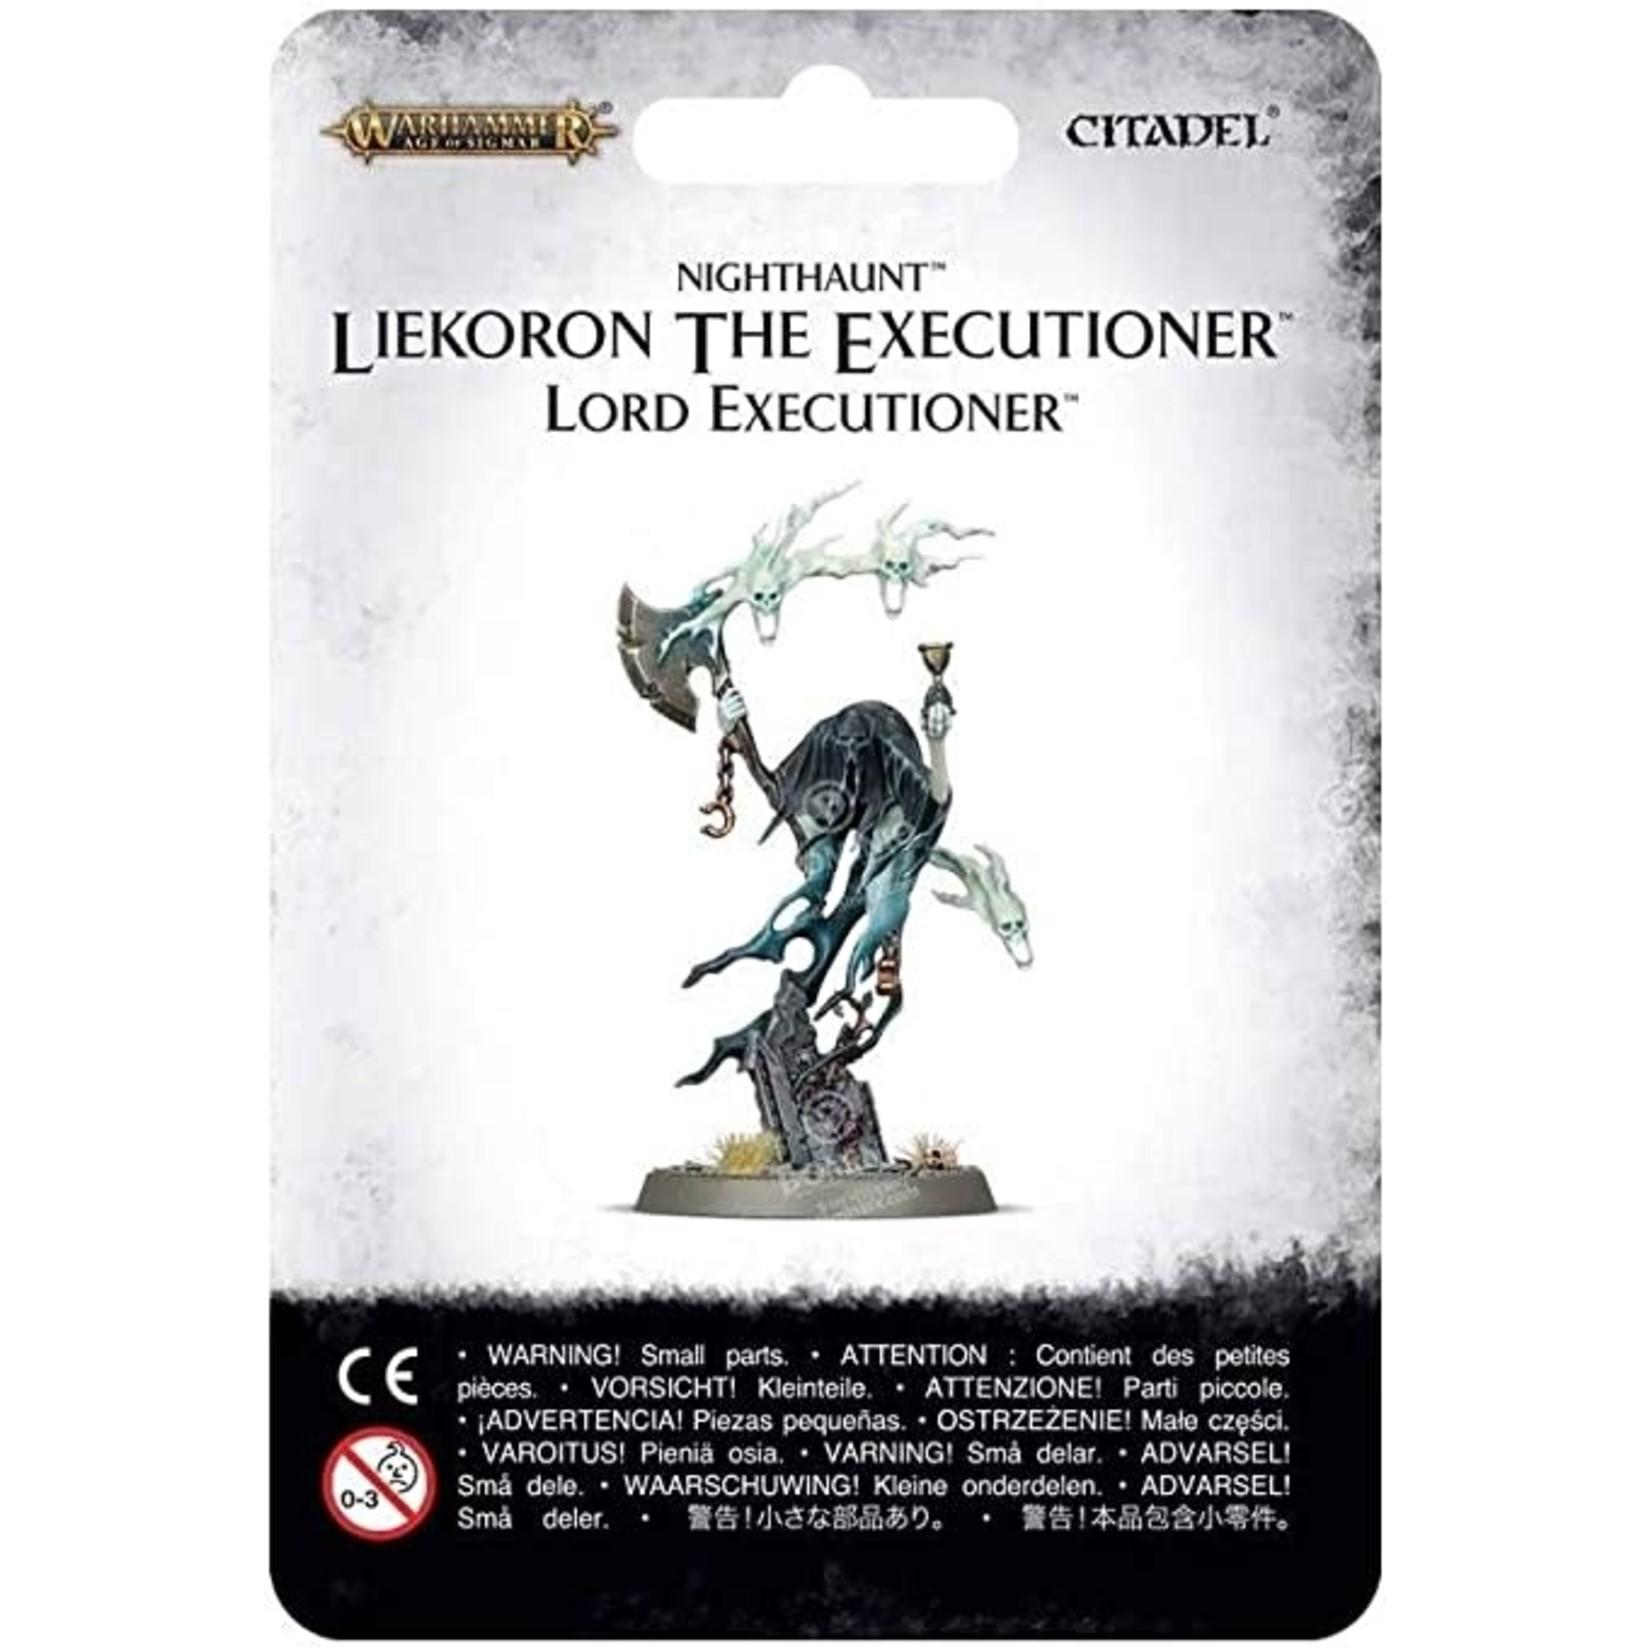 Nighthaunt Liekoron the Executioner (AOS)